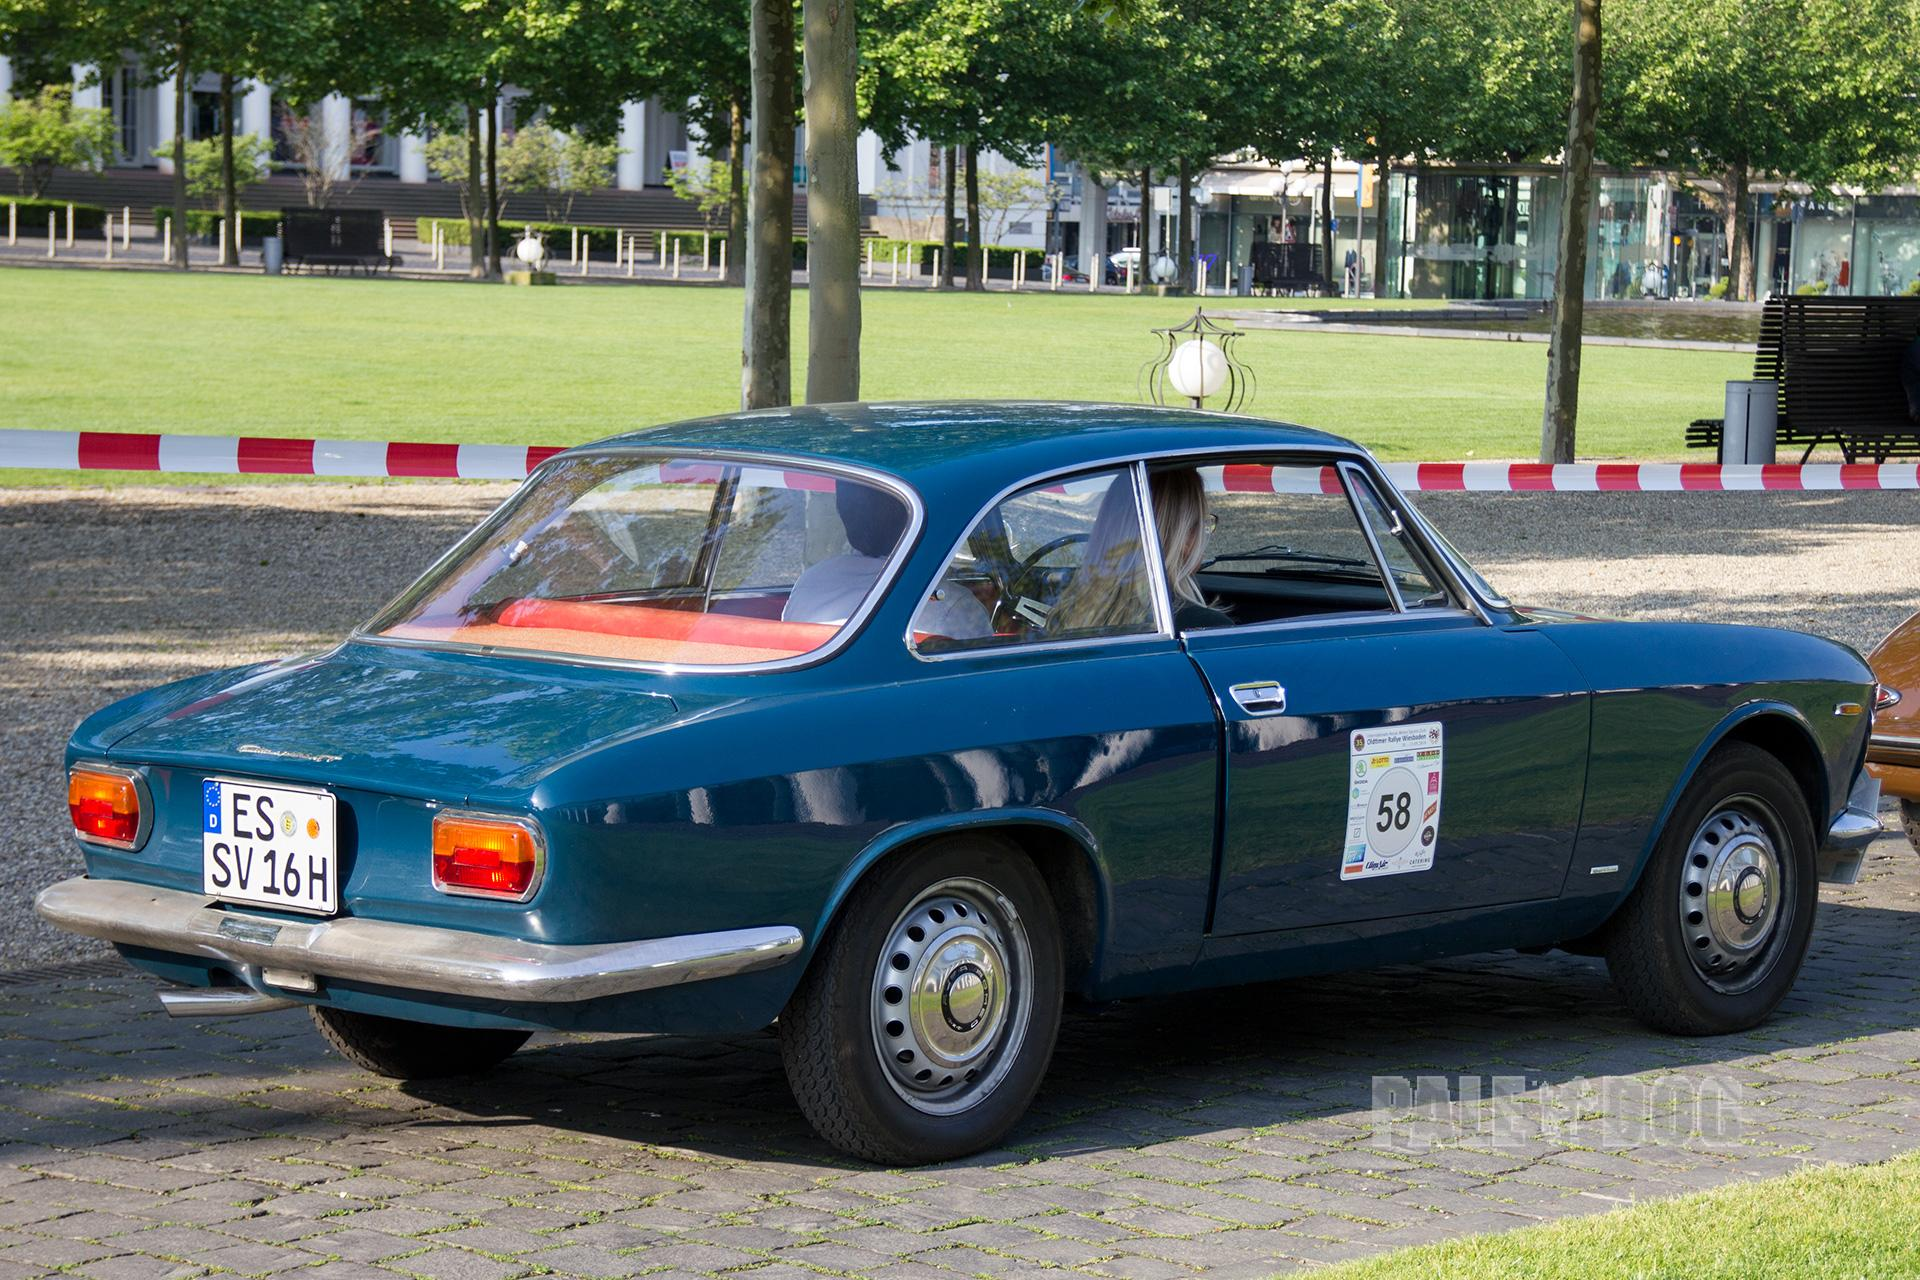 1964 Alfa Romeo Giulia Sprint Gt Rear View 1960s Paledog Photo